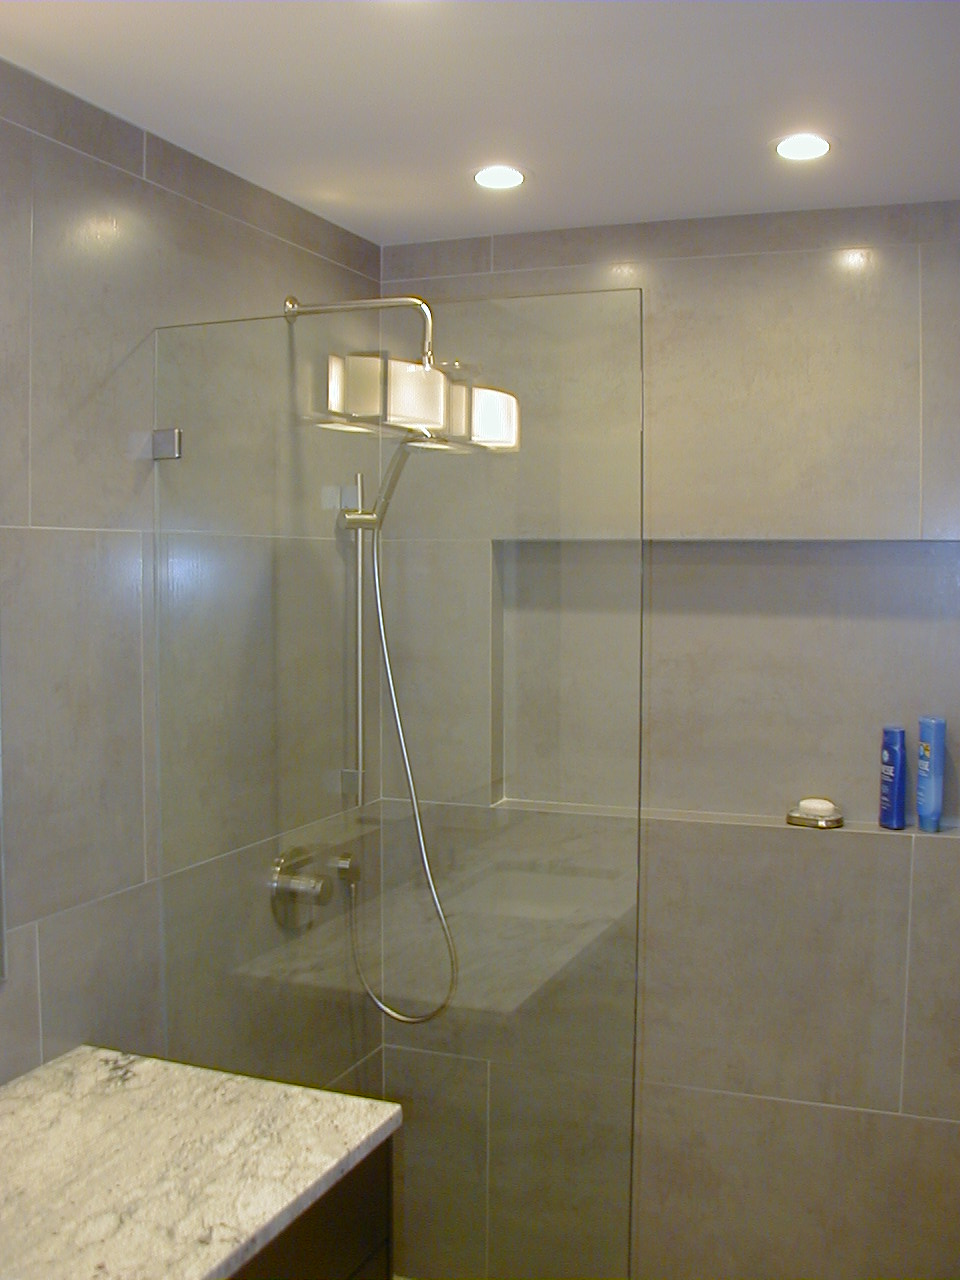 Bathroom Remodel in Rohnert Park, CA.